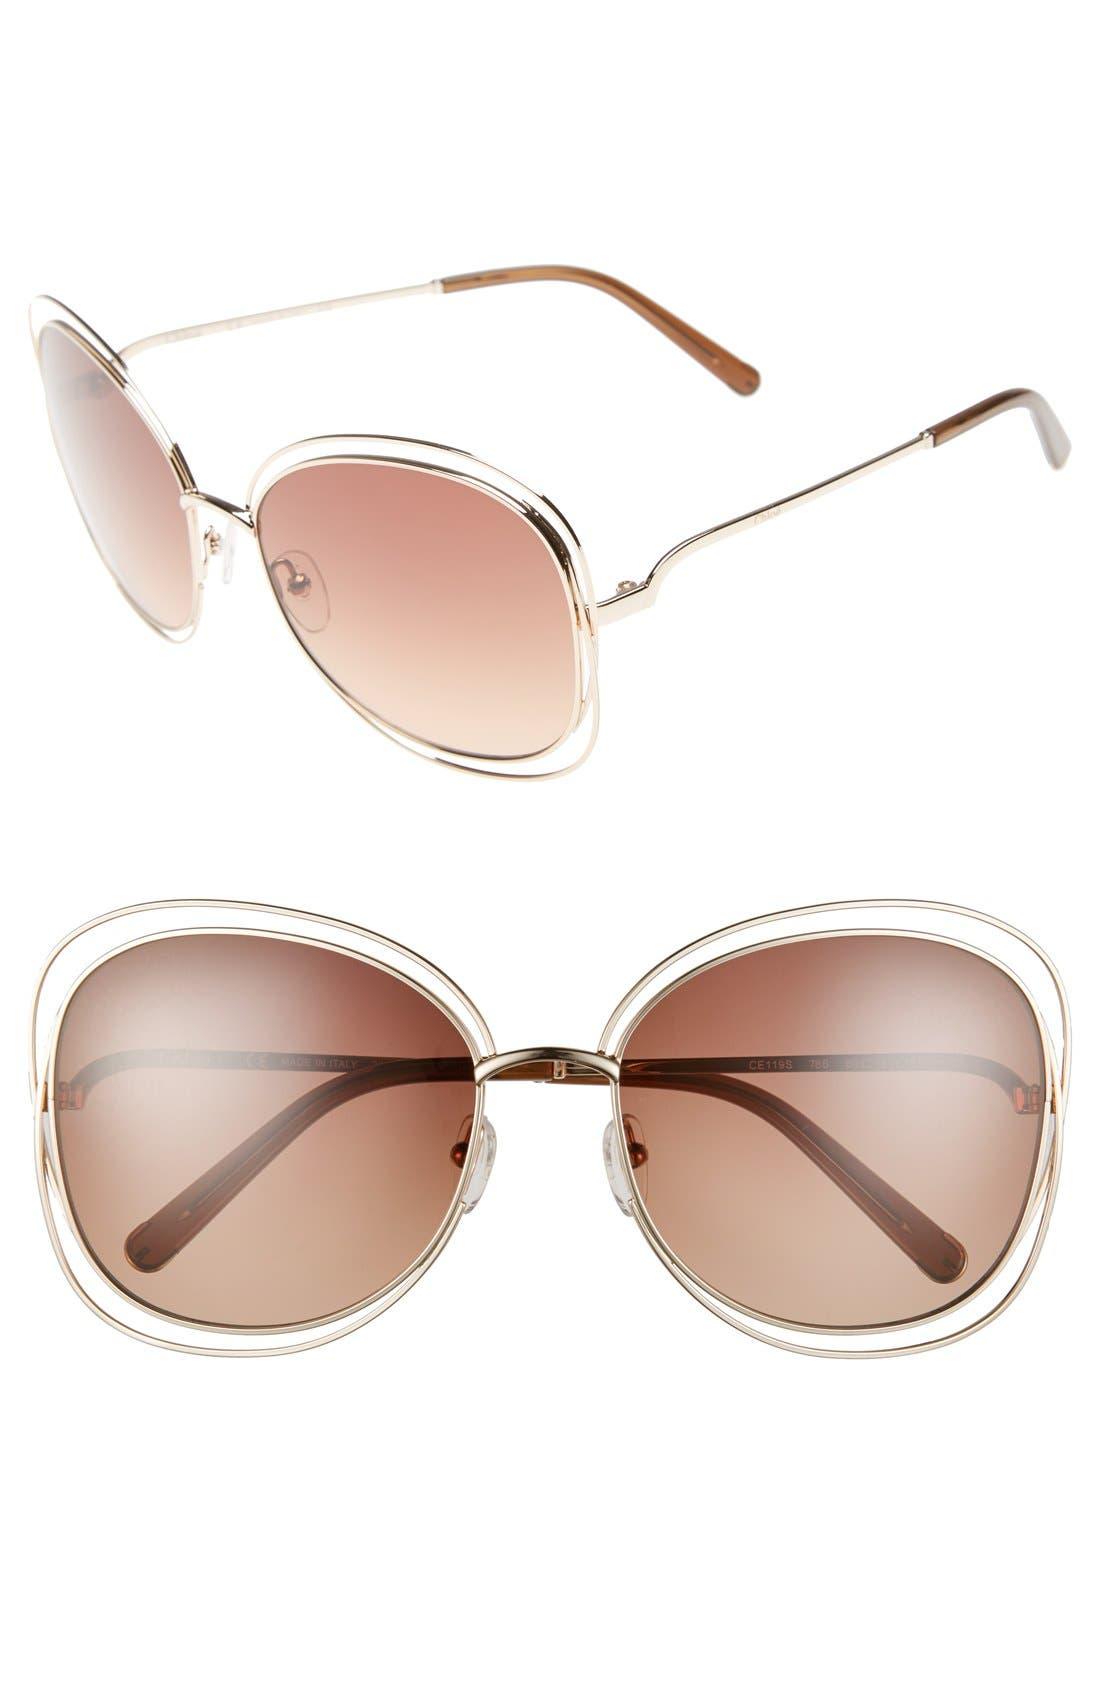 2ffaf655a81 Round Sunglasses for Women